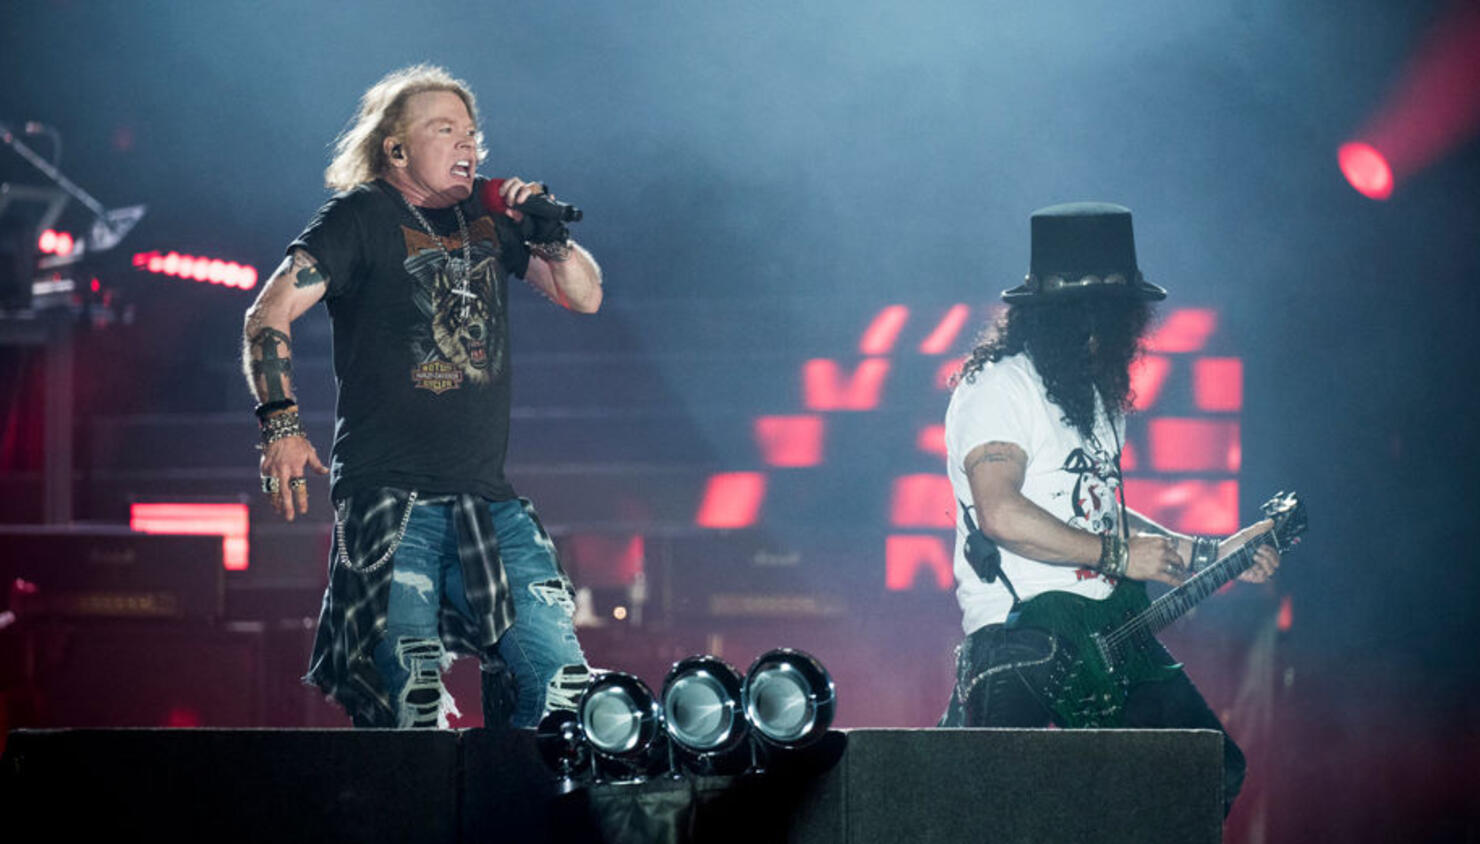 Guns N' Roses Breaks Swedish Concert Attendance Record Set by Metallica